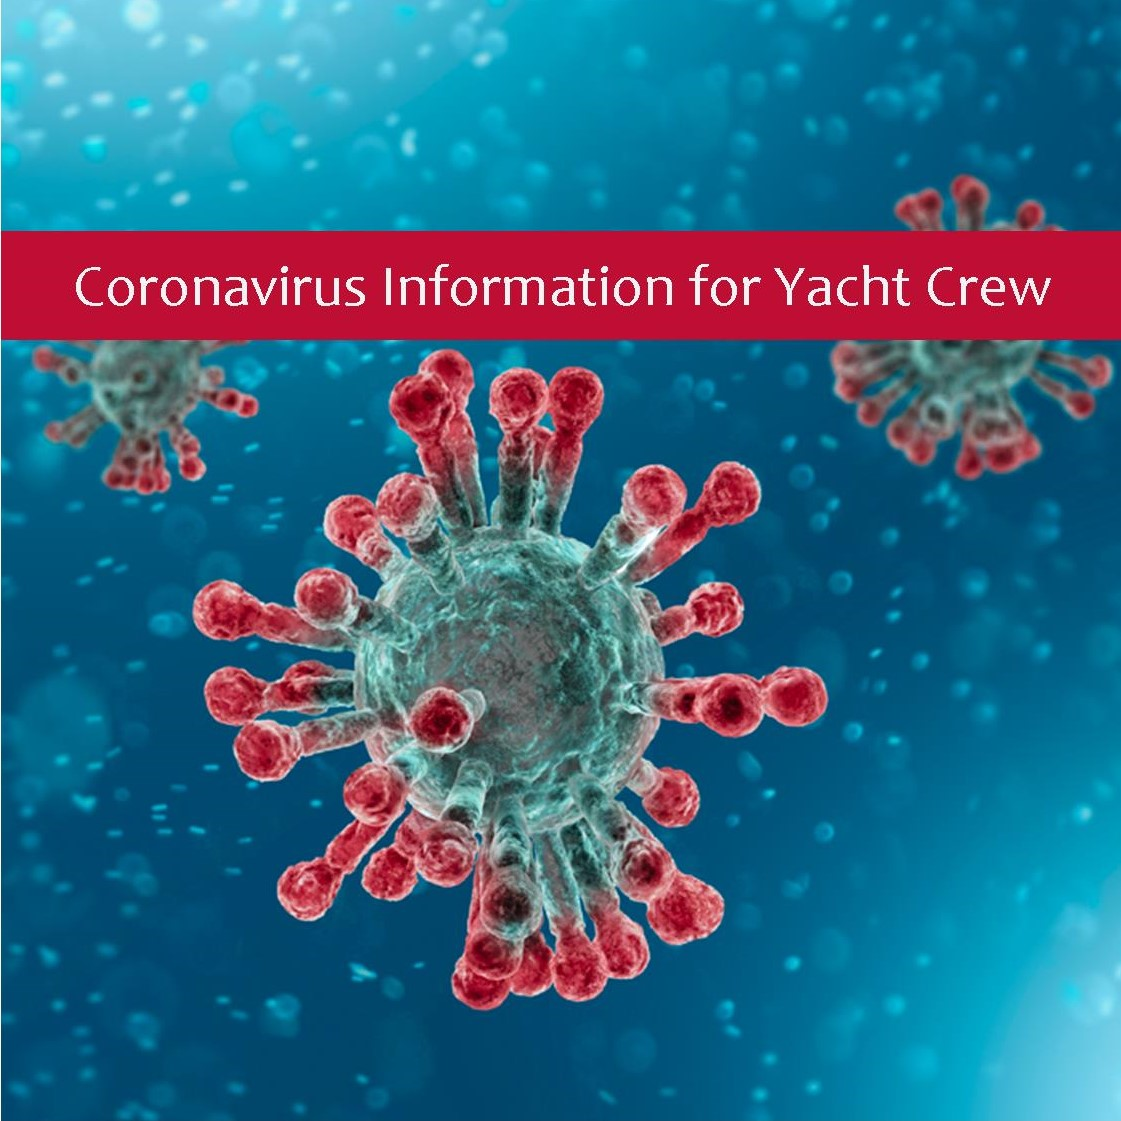 Fairport's Master Notice regarding Coronavirus, COVID-19